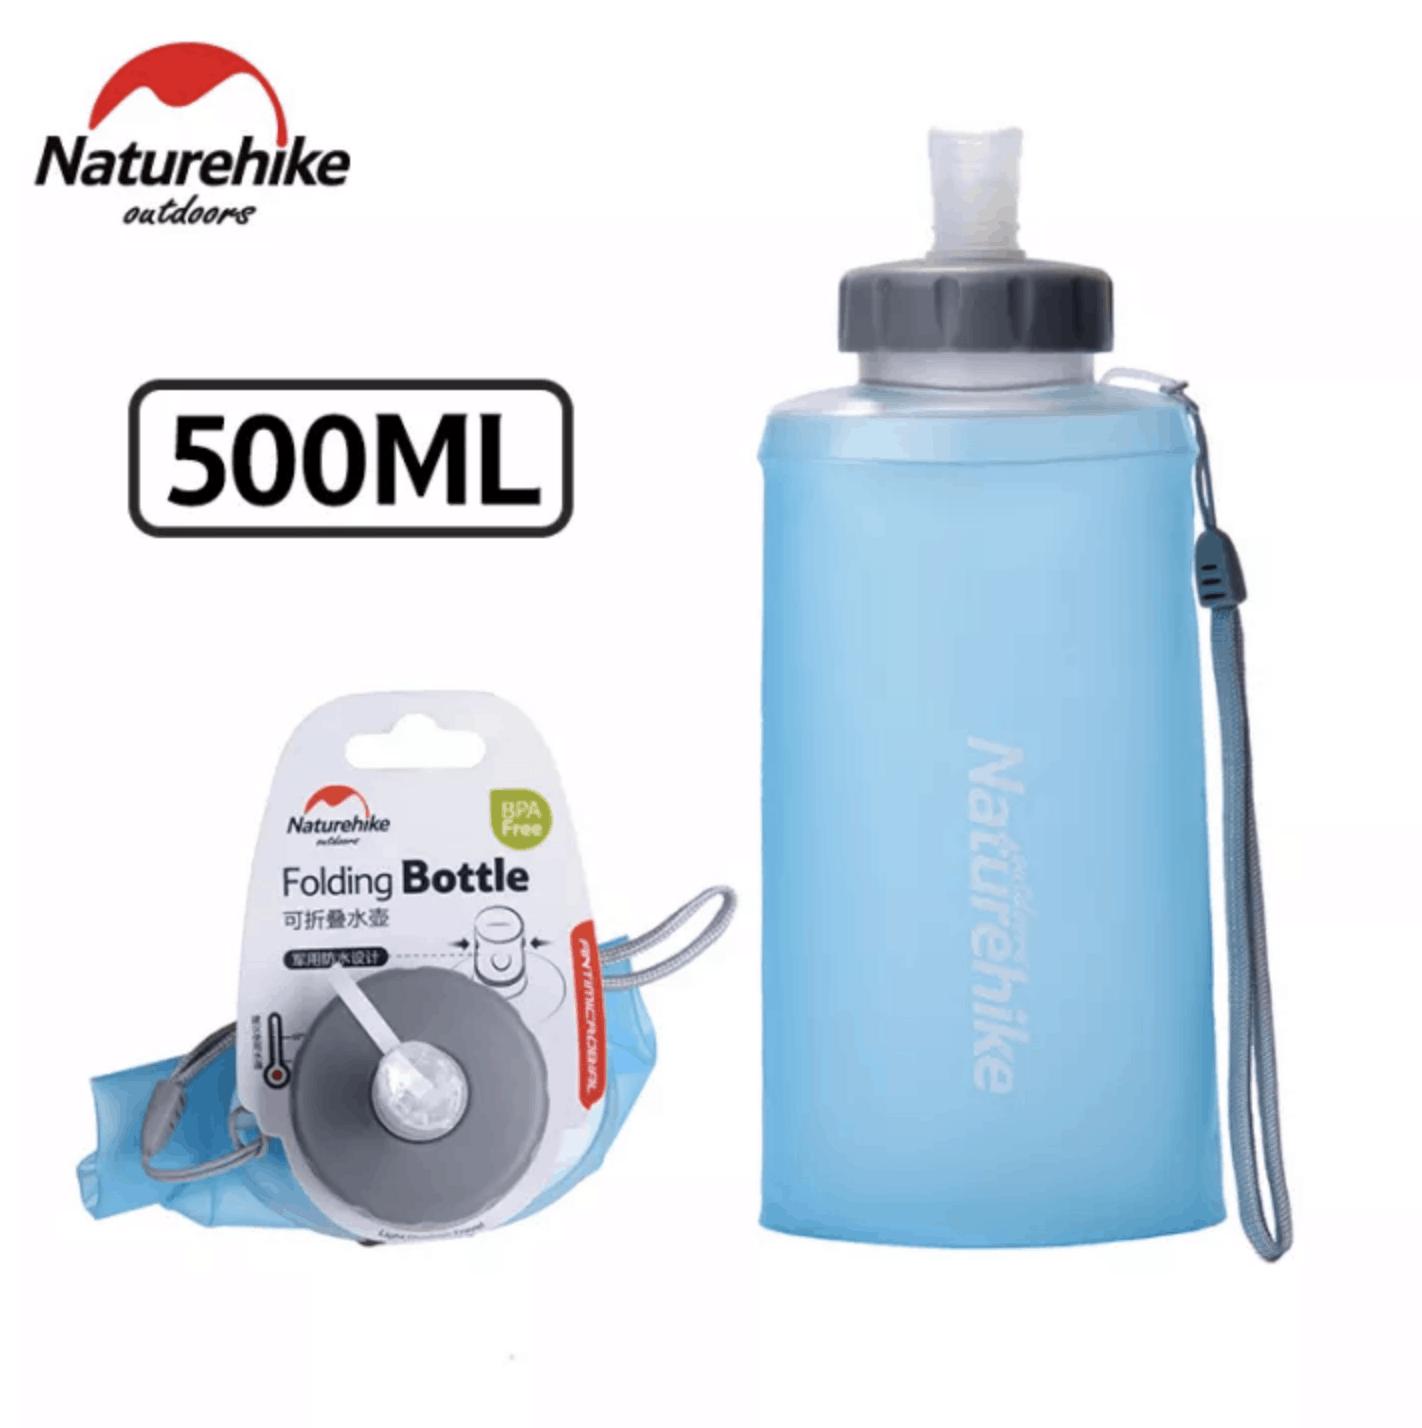 Folding Bottle, Naturehike Bottle, Eco-friendly Bottle, Hiking Bottle, Running Bottle, Botol Mesra Alam Sekitar